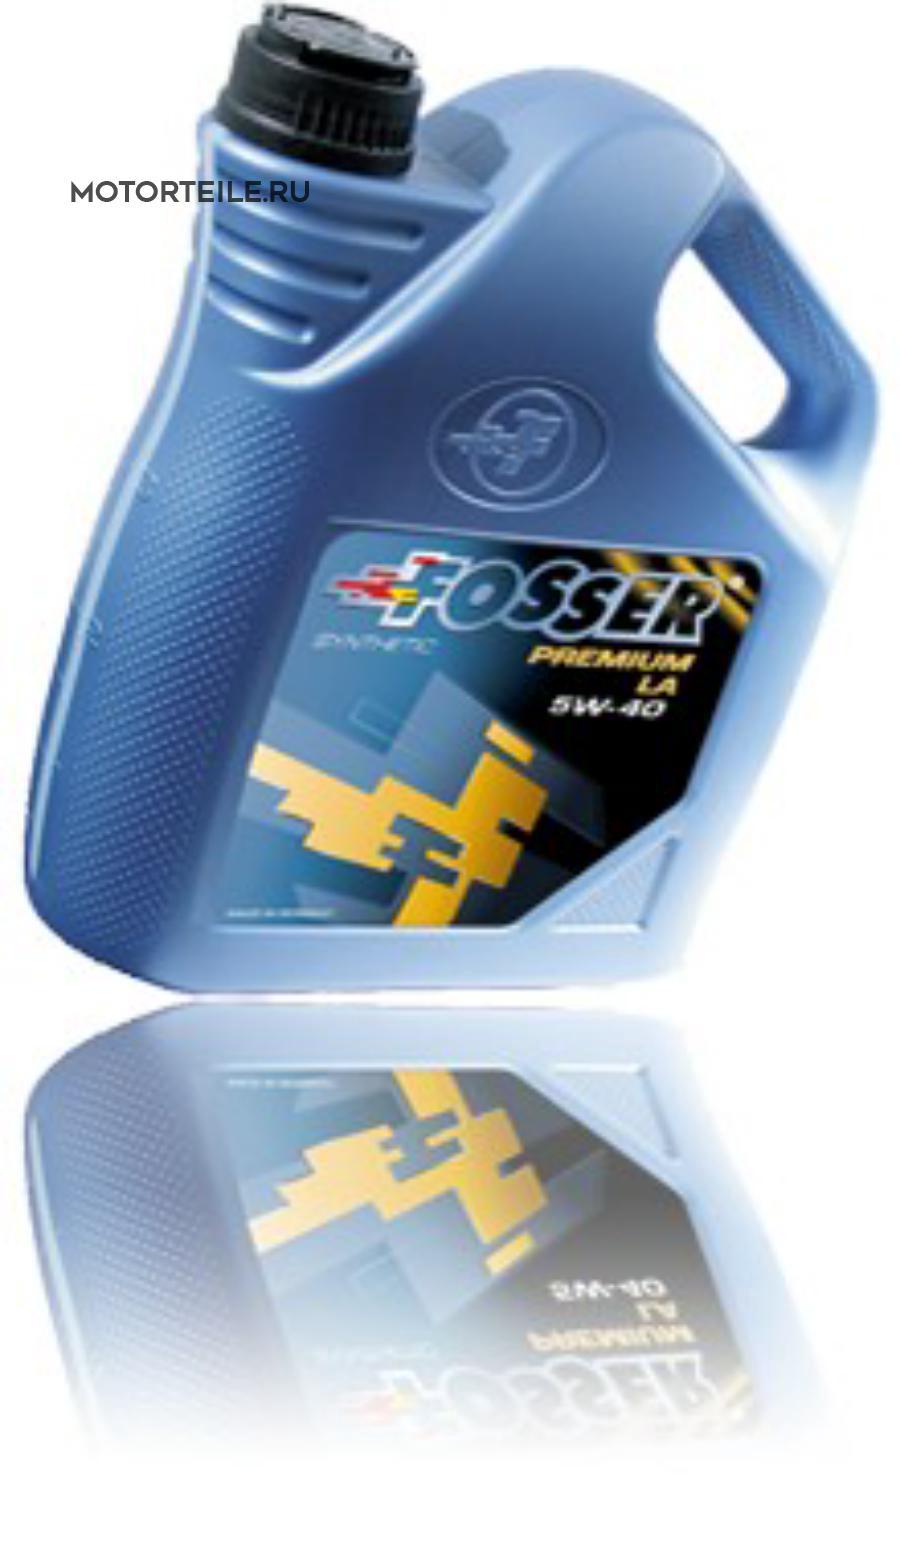 Масло моторное Fosser Premium LA 5W-40 (1л)